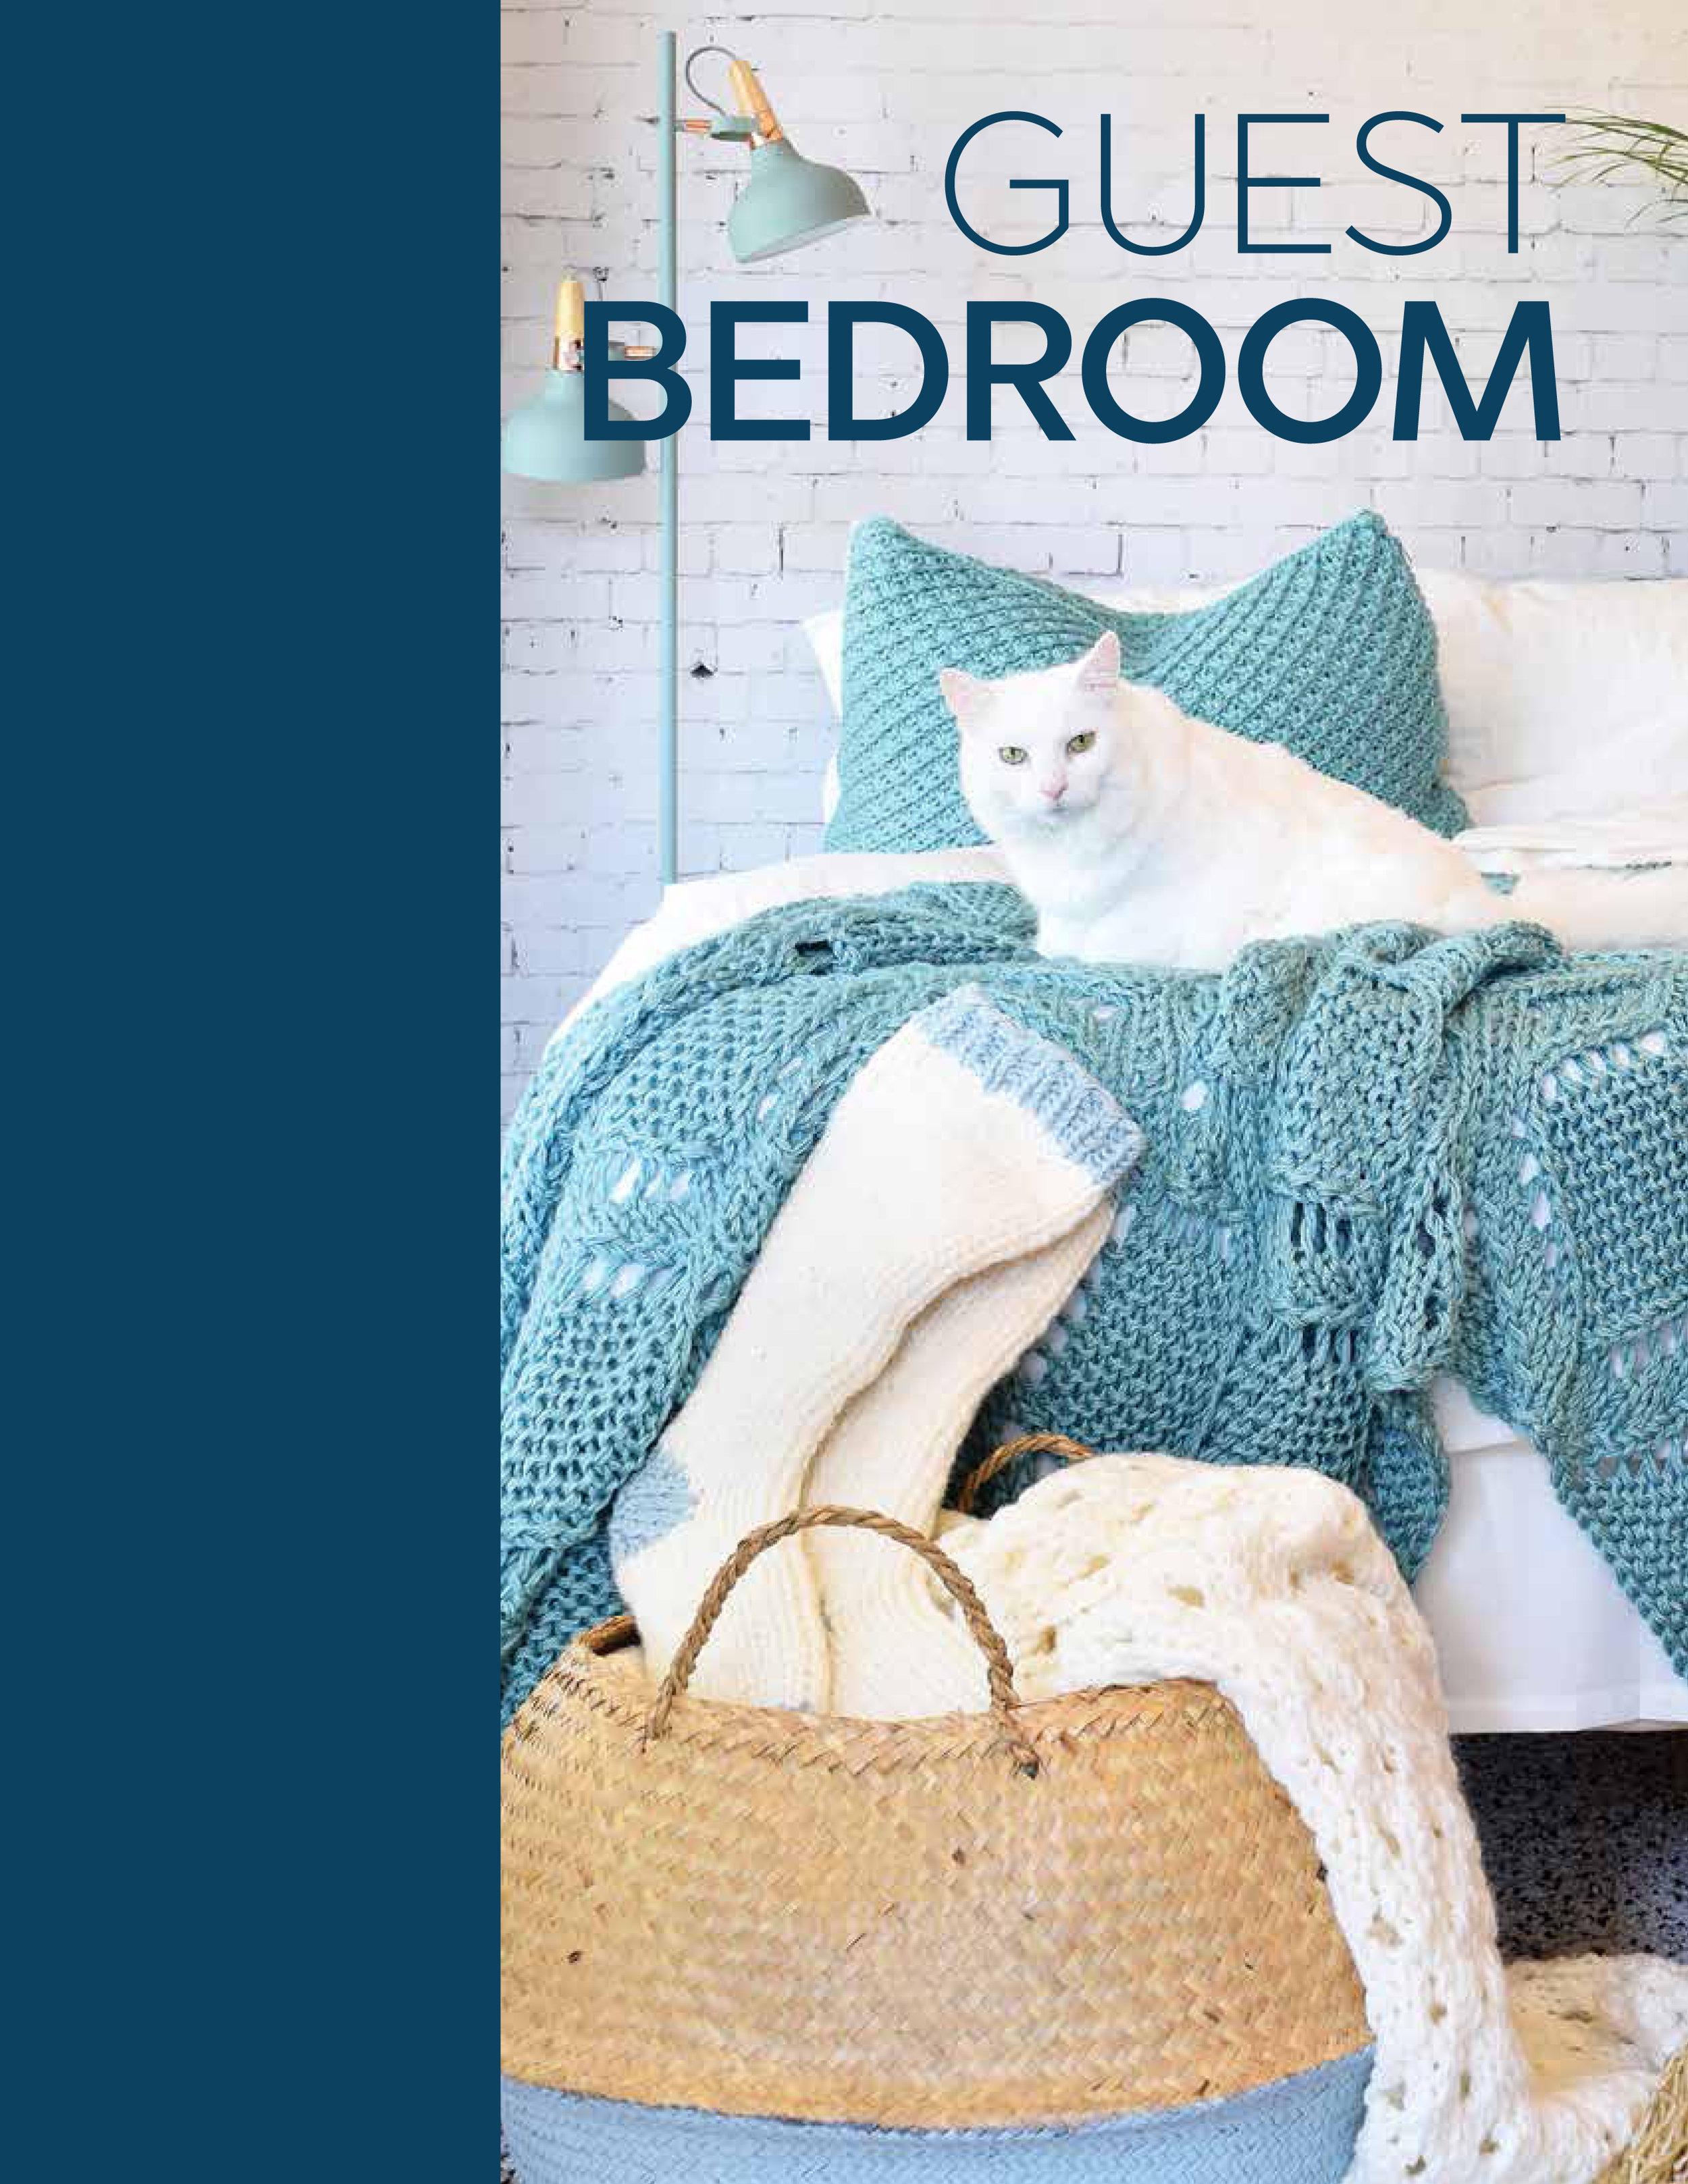 Guest Bedroom - Diamond Lace BlanketDaisy PillowcaseEyelet Throw BlanketCozy Slipper Socks